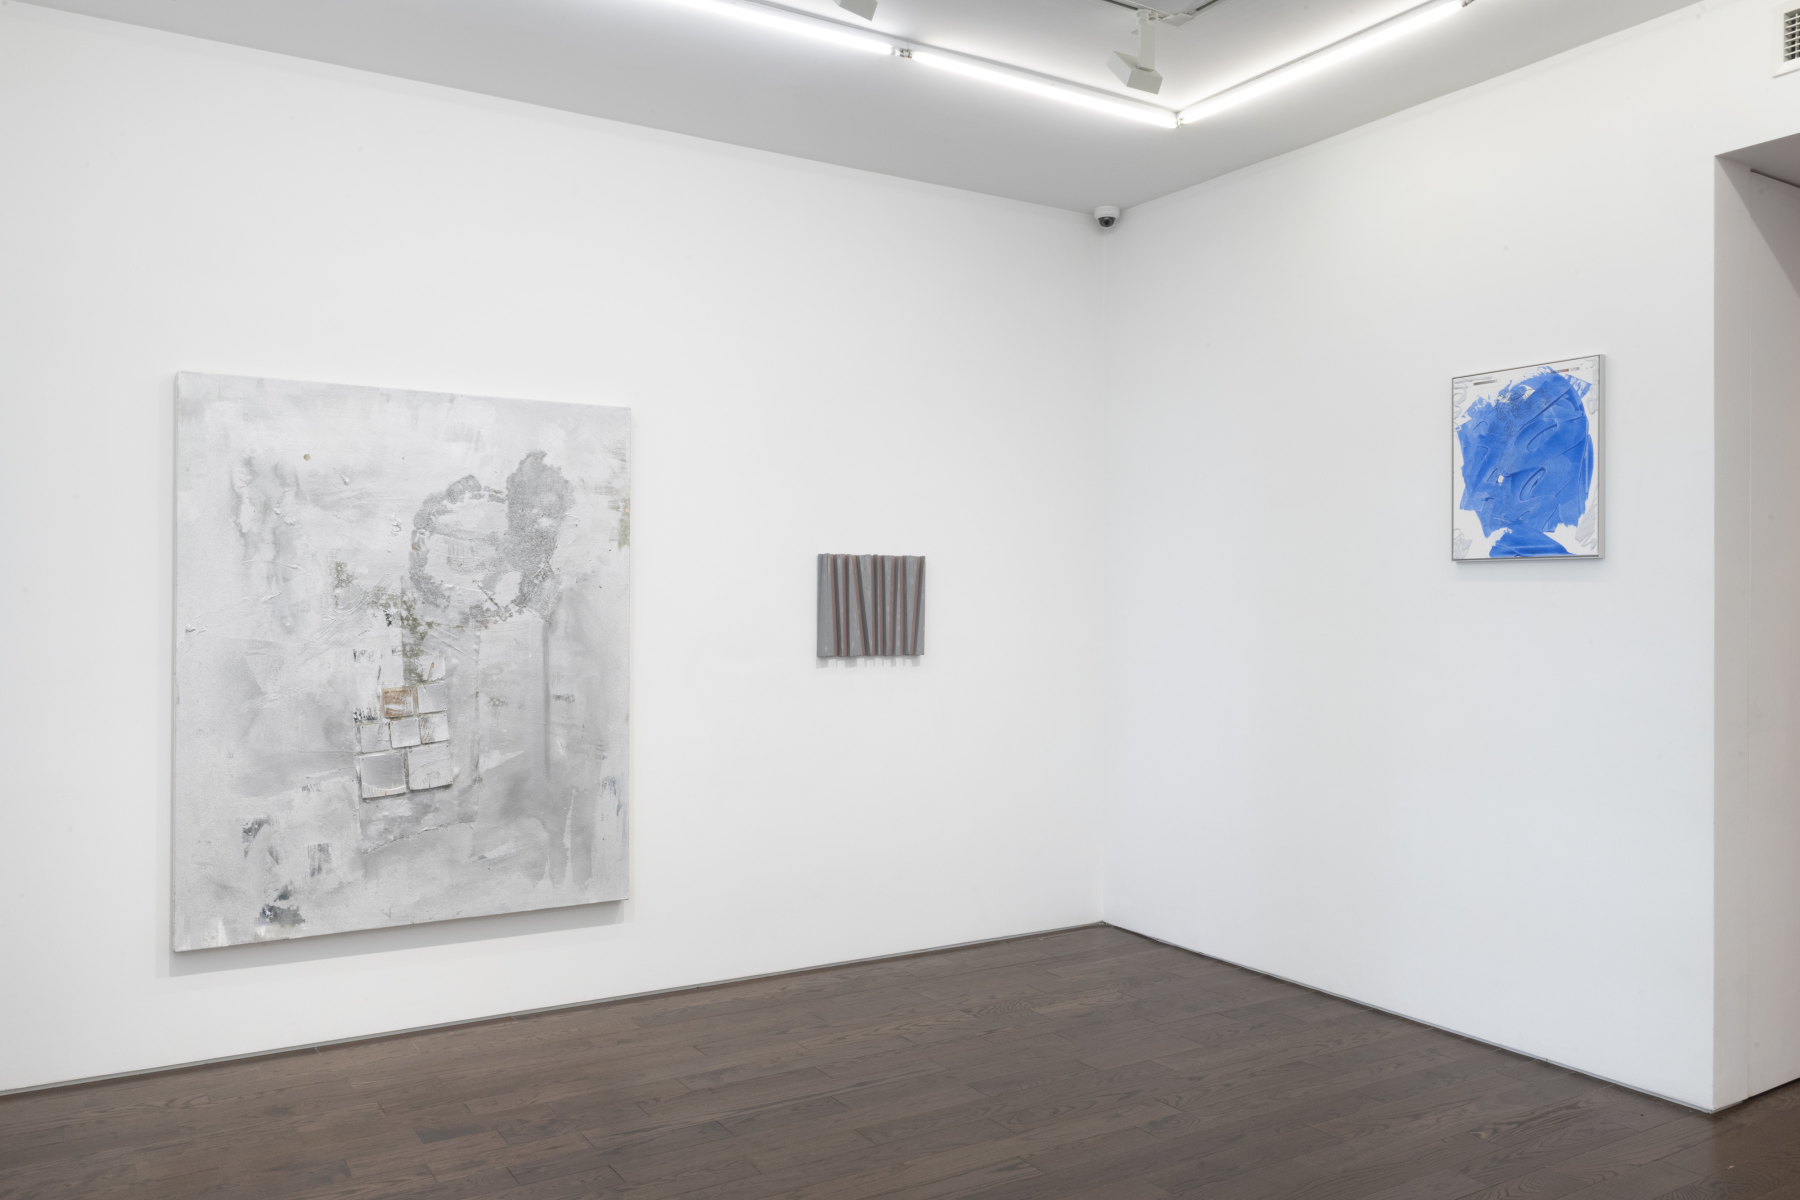 Exhibition View Wrecked Angle Ceysson & Bénétière New York 2021 (7)